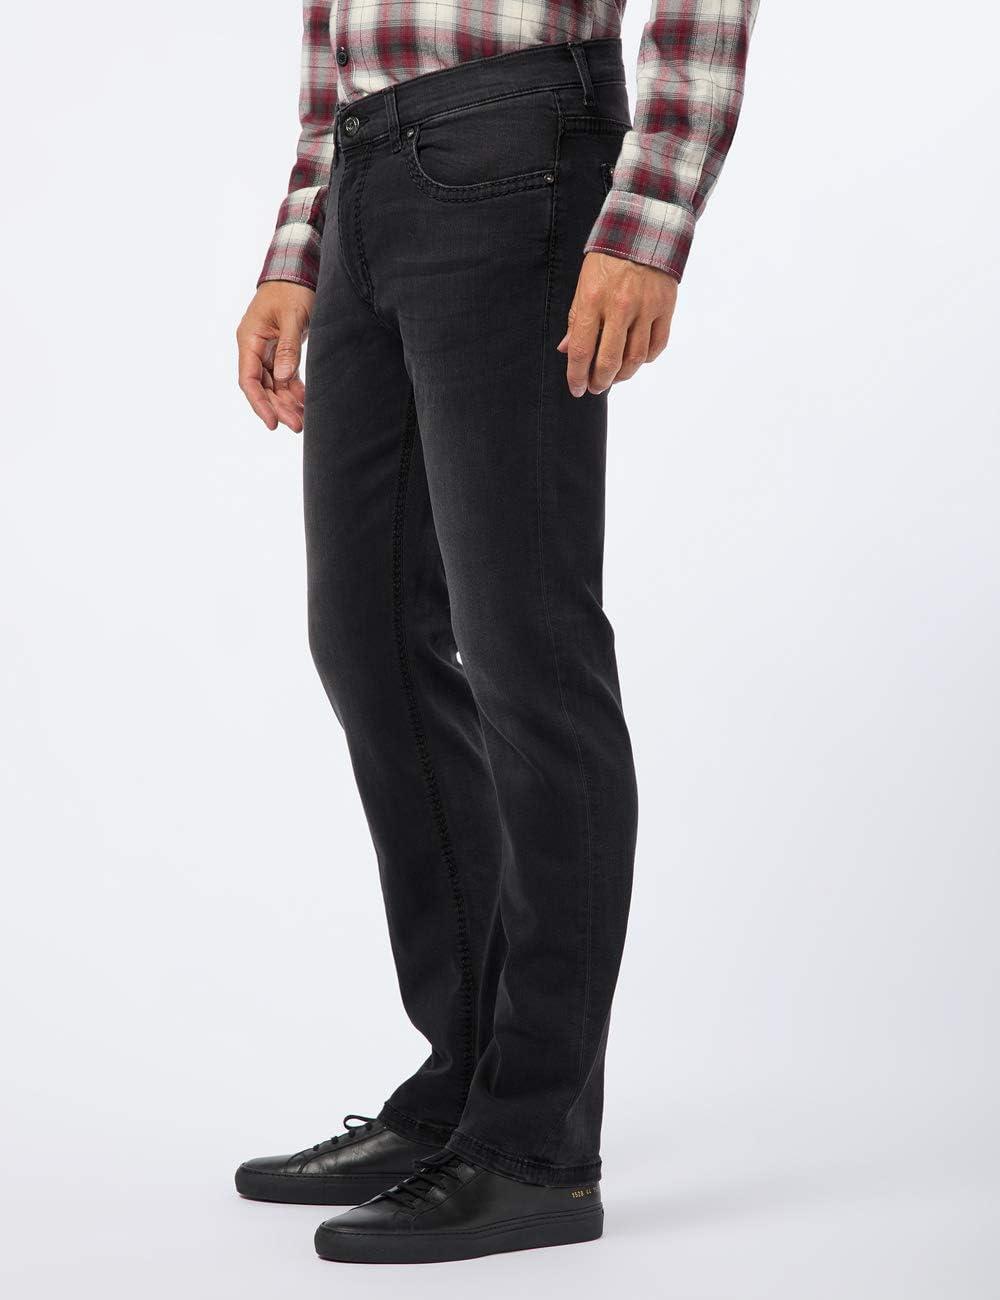 Pioneer Rando Hand Crafted Straight Jeans voor heren zwart (dark used with buffies 440).